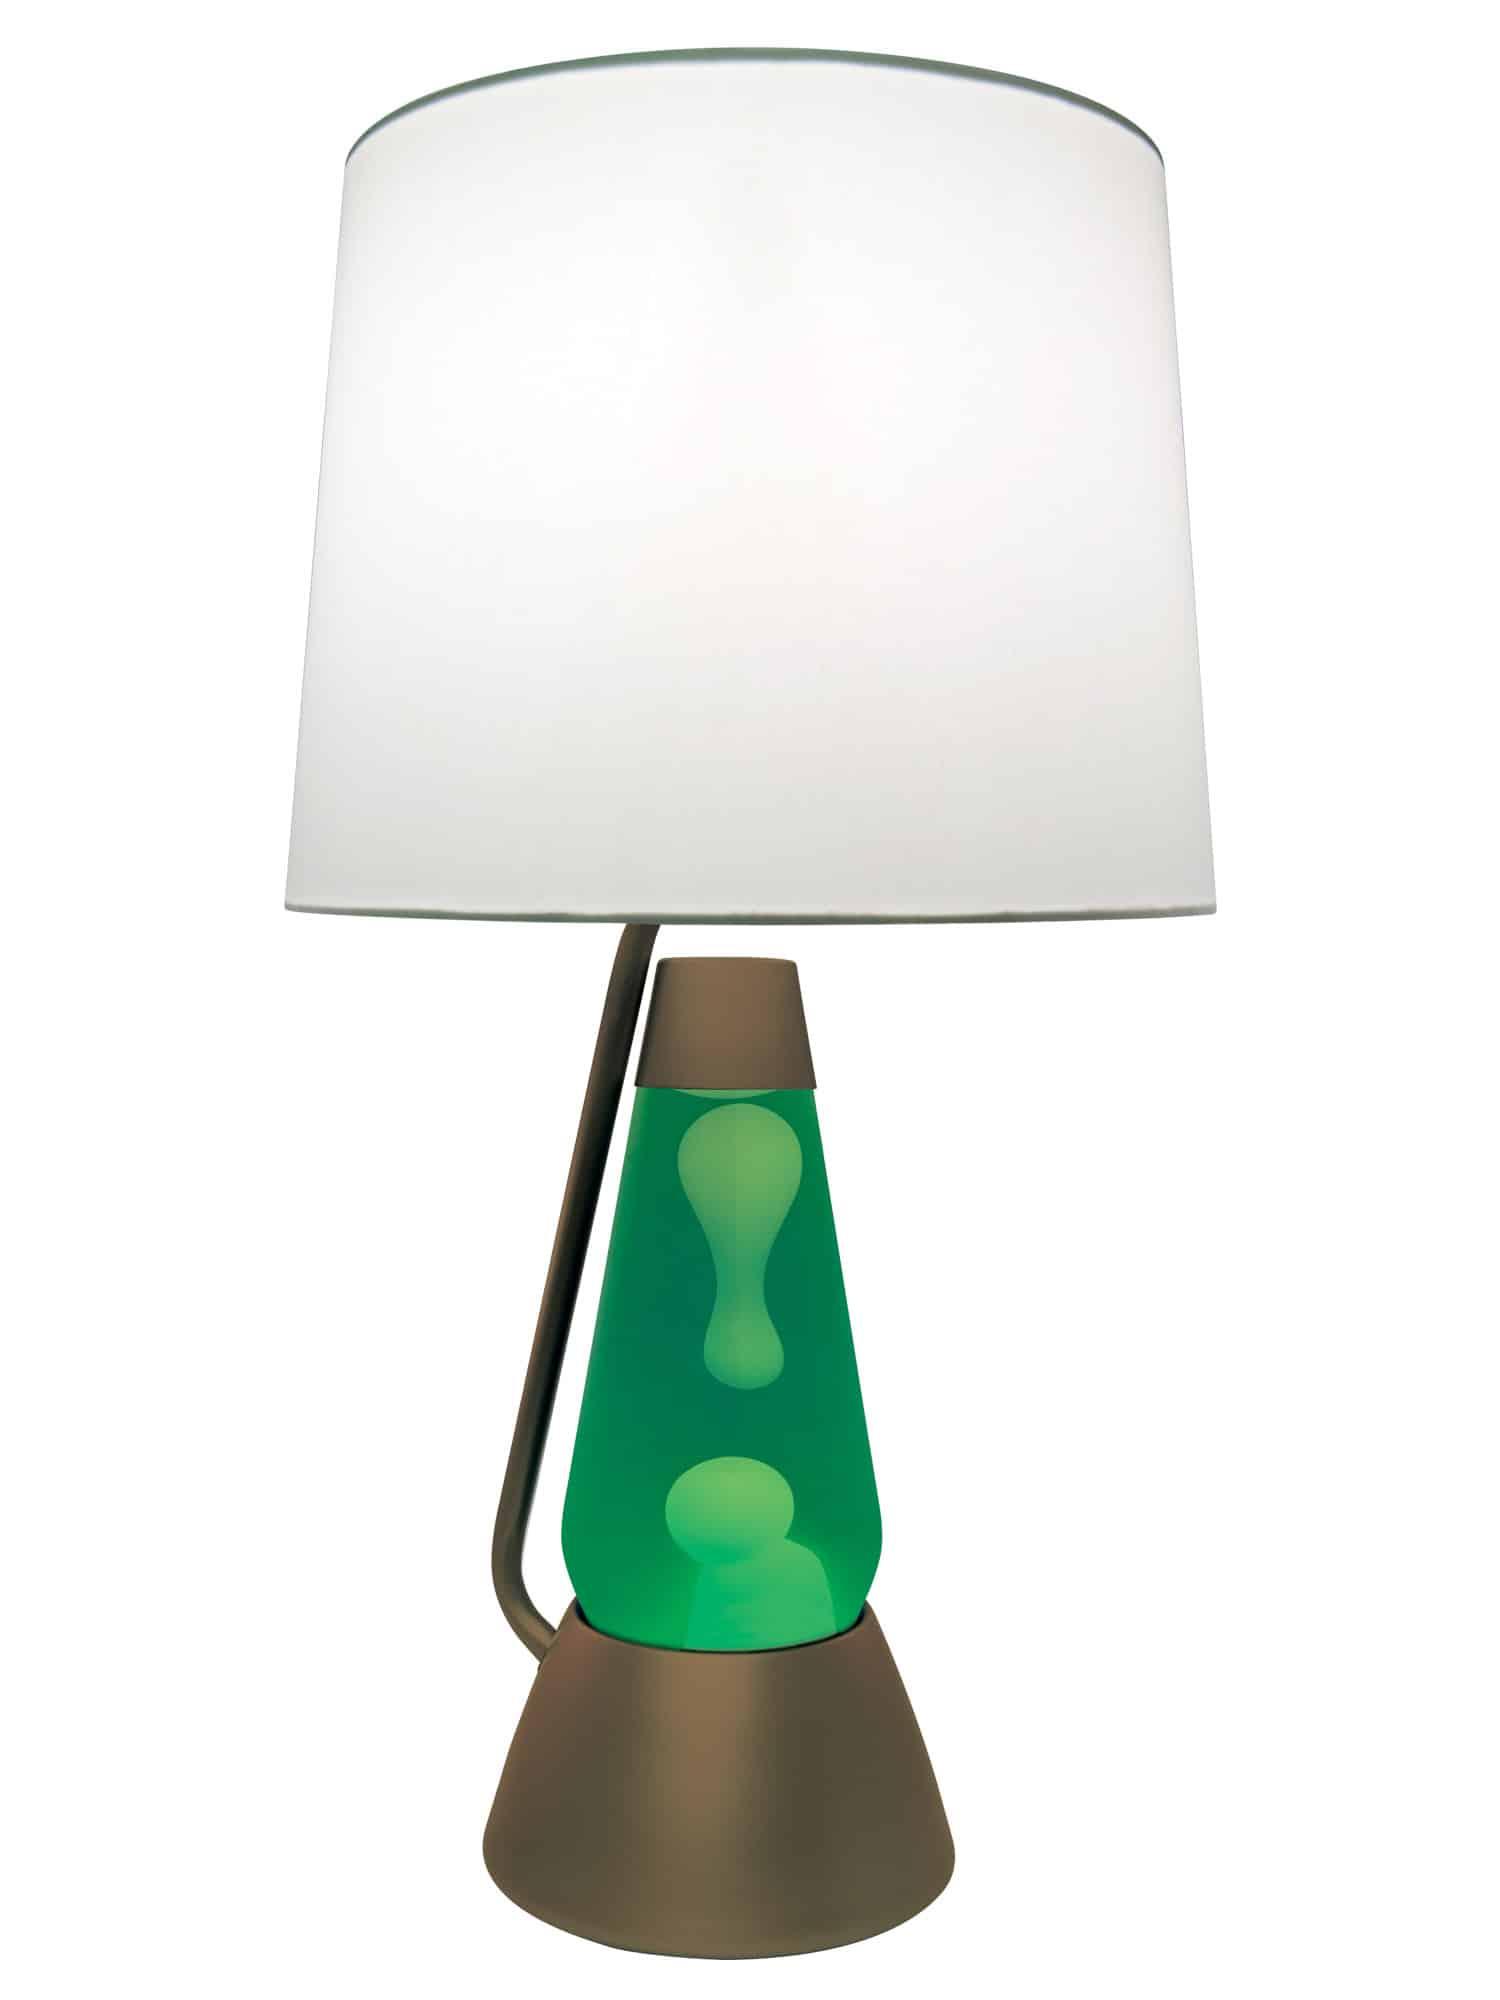 Brightsource Lava Lamp Stylish Interior Decorative Lighting